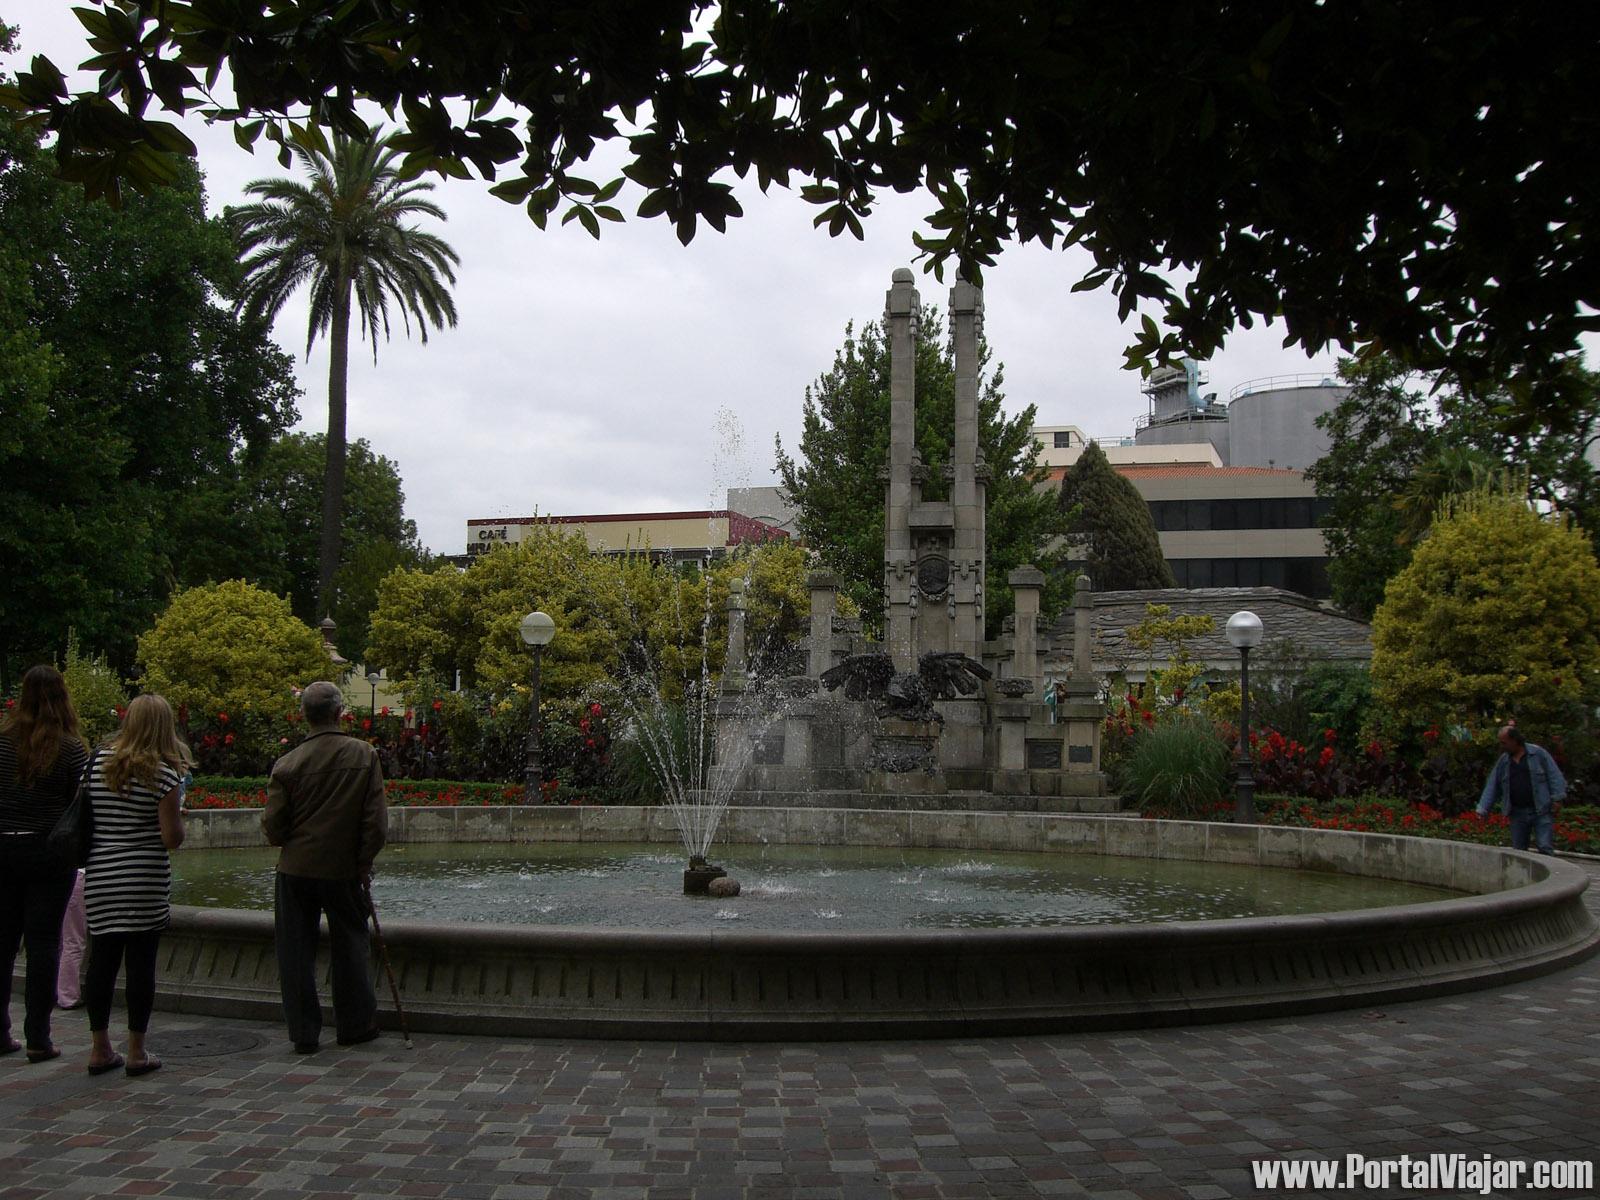 Parque de María PIta (A Coruña)